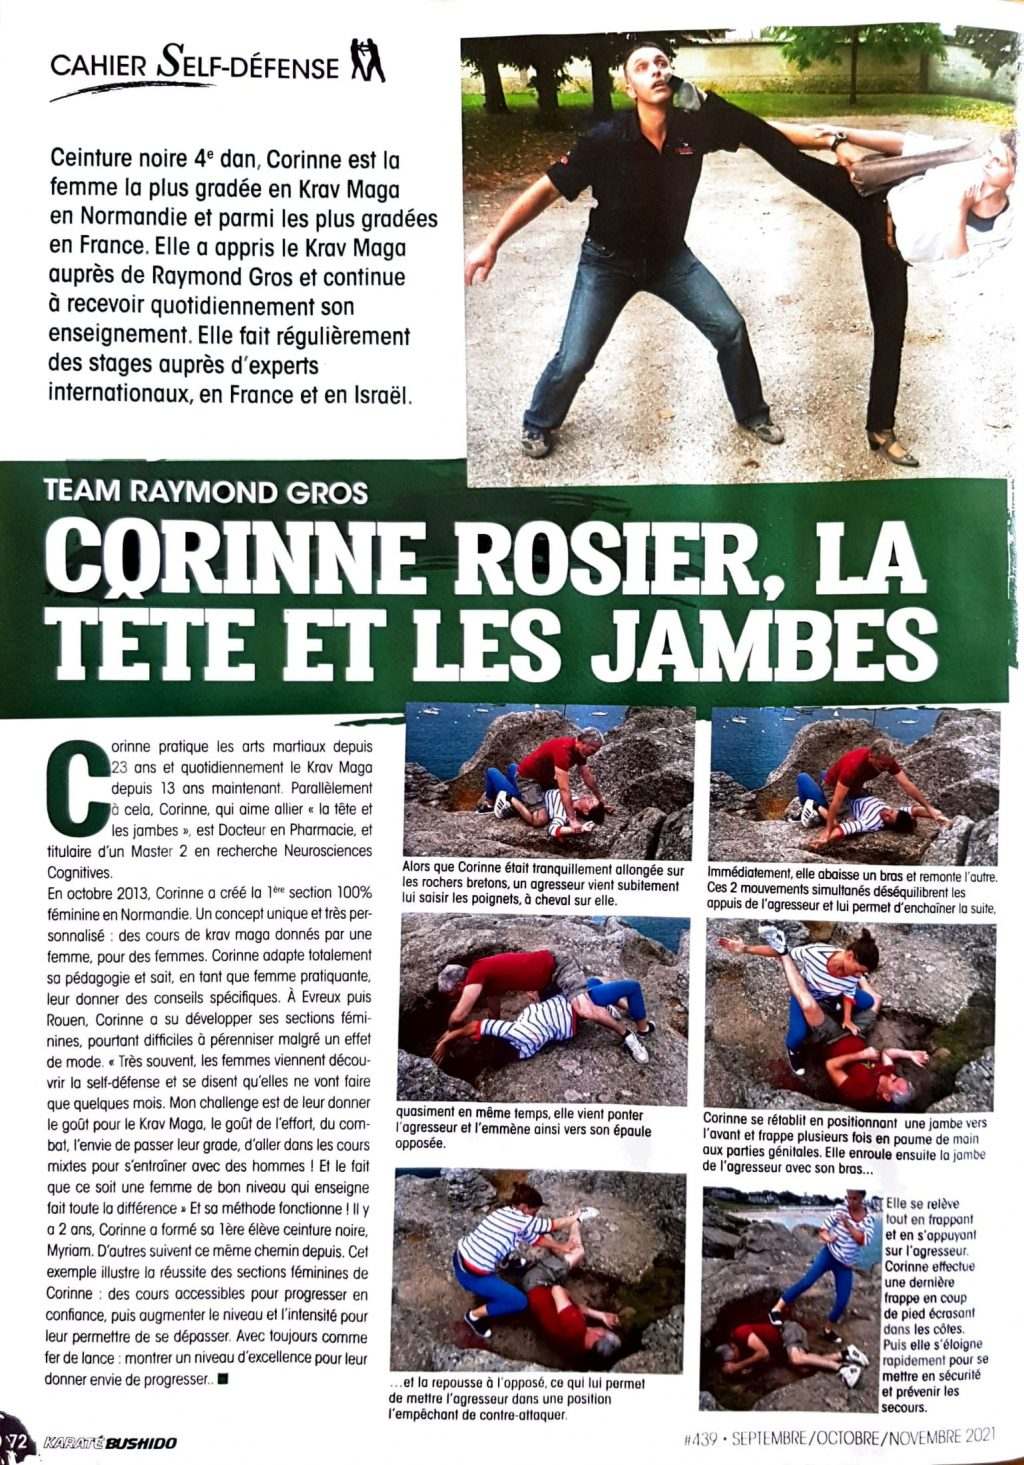 Corinne Rosier Bushido